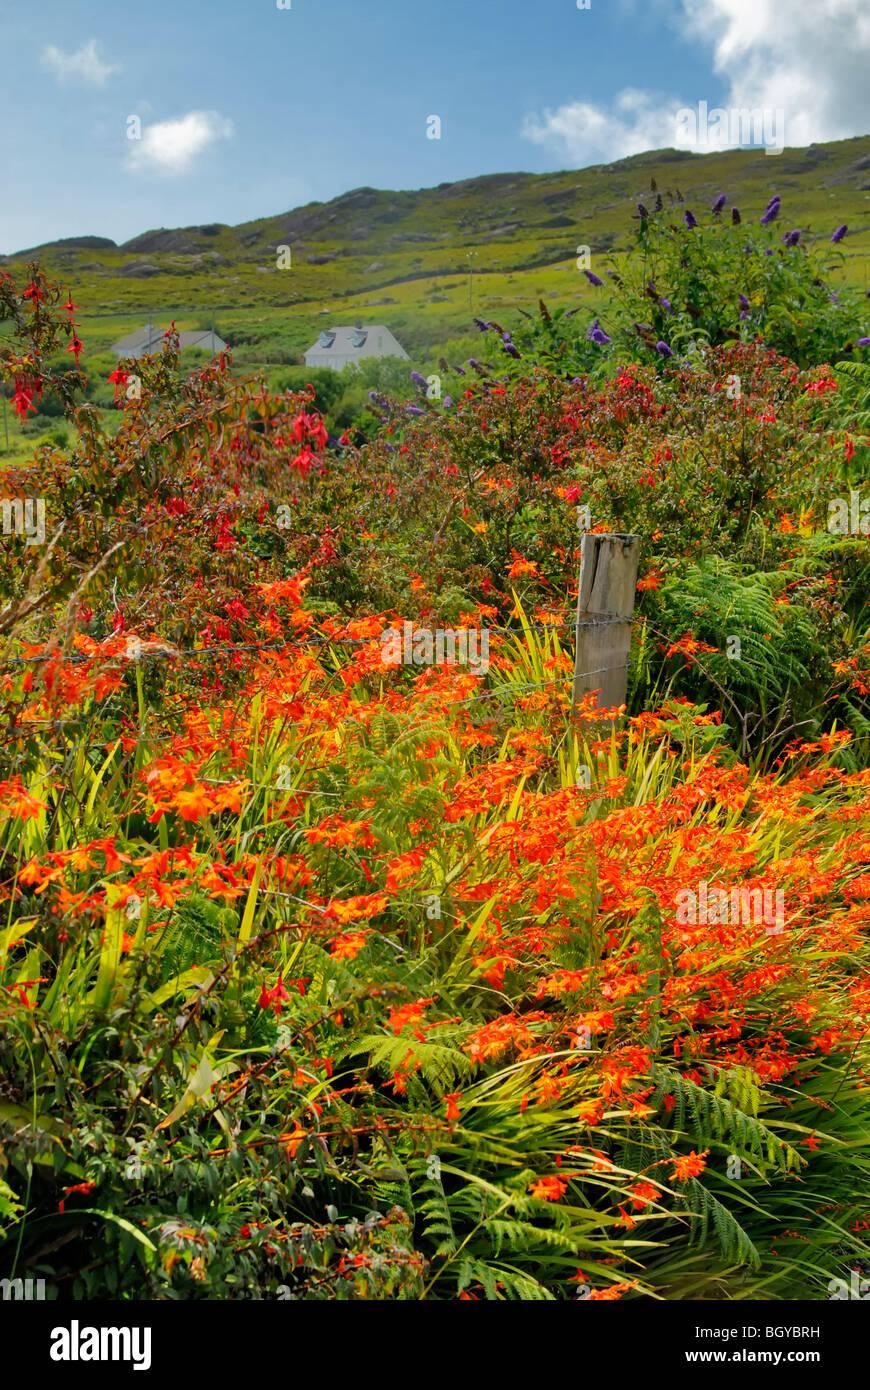 Fleurs sauvages dans un paysage campagnard Killarney Irlande Photo Stock